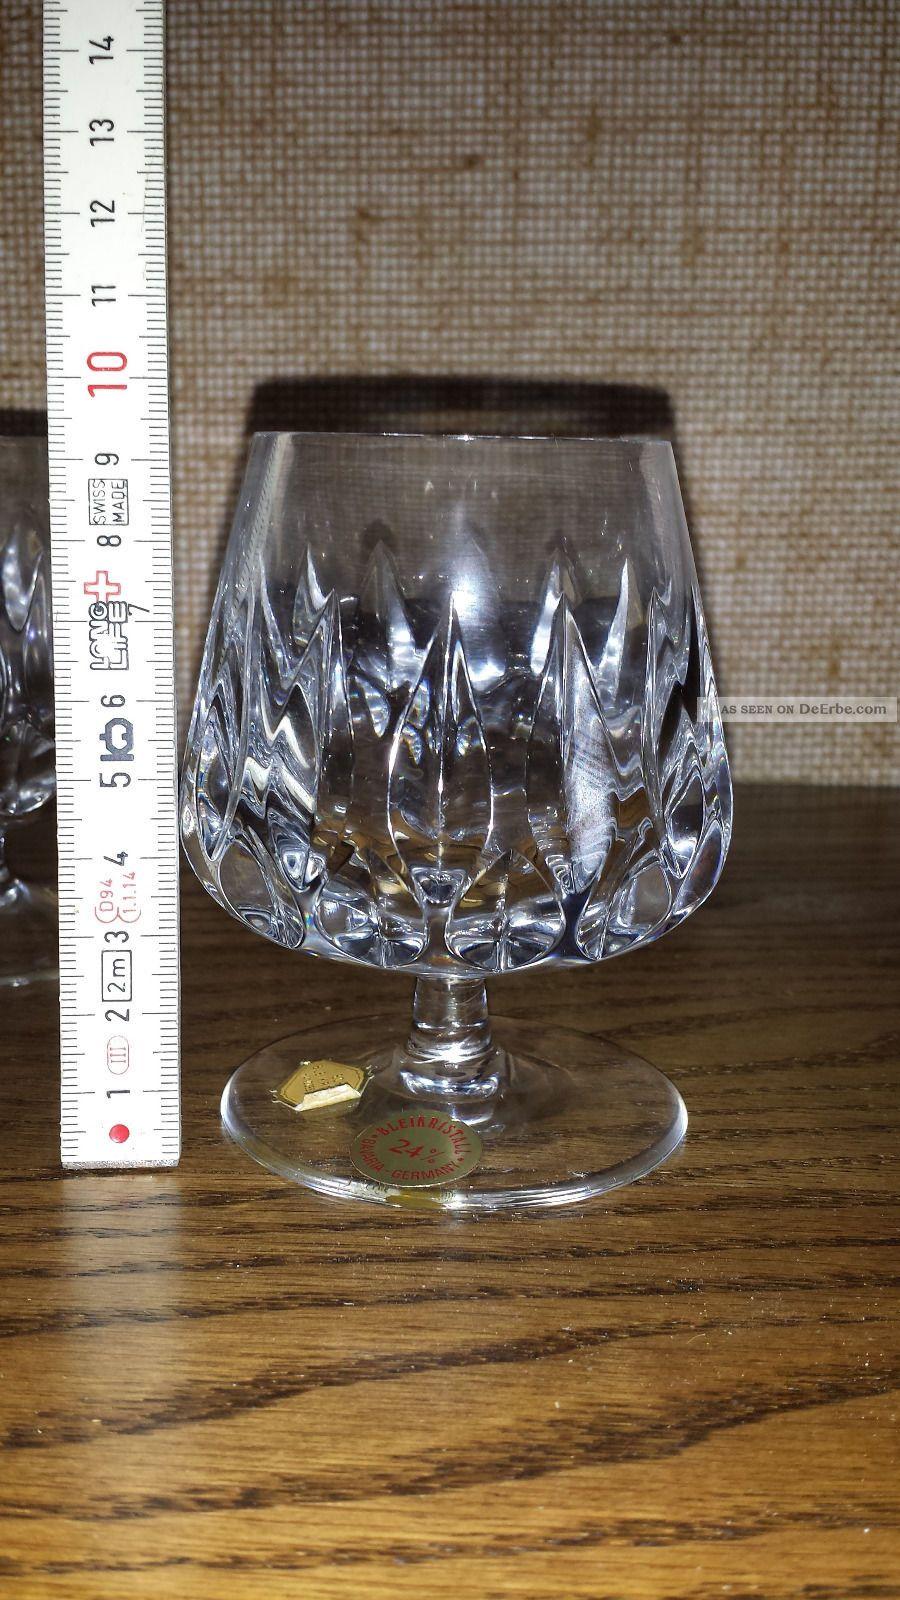 6 kleine cognac gl ser patrizia nachtmann 24 bleikristall bavaria germany. Black Bedroom Furniture Sets. Home Design Ideas